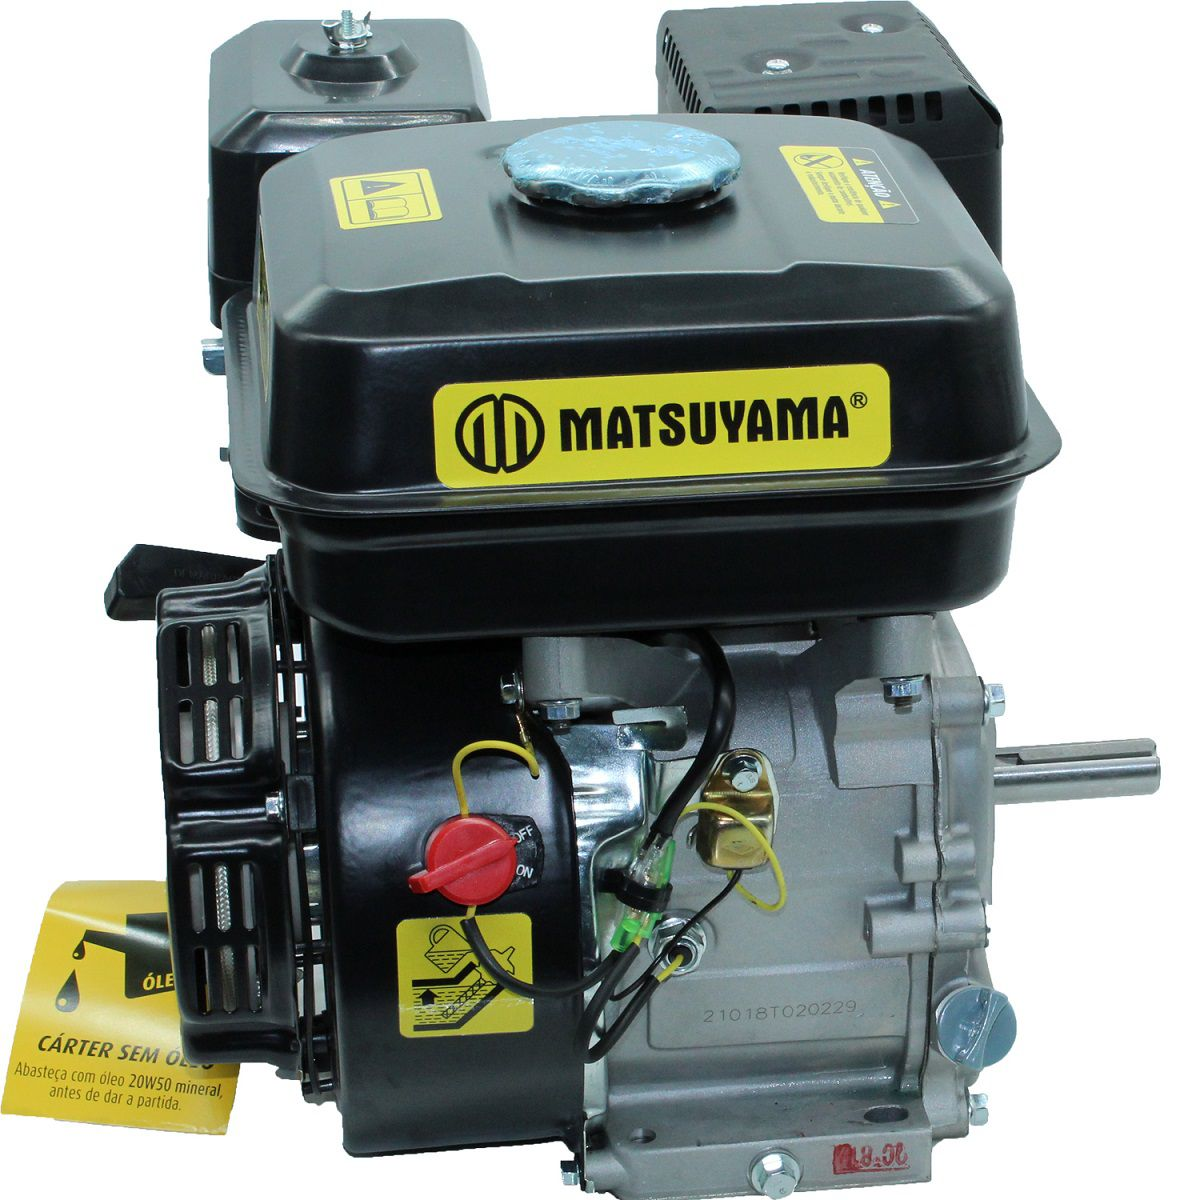 Motor Multiuso a Gasolina 4 Tempos 7HP Partida Manual Matsuyama